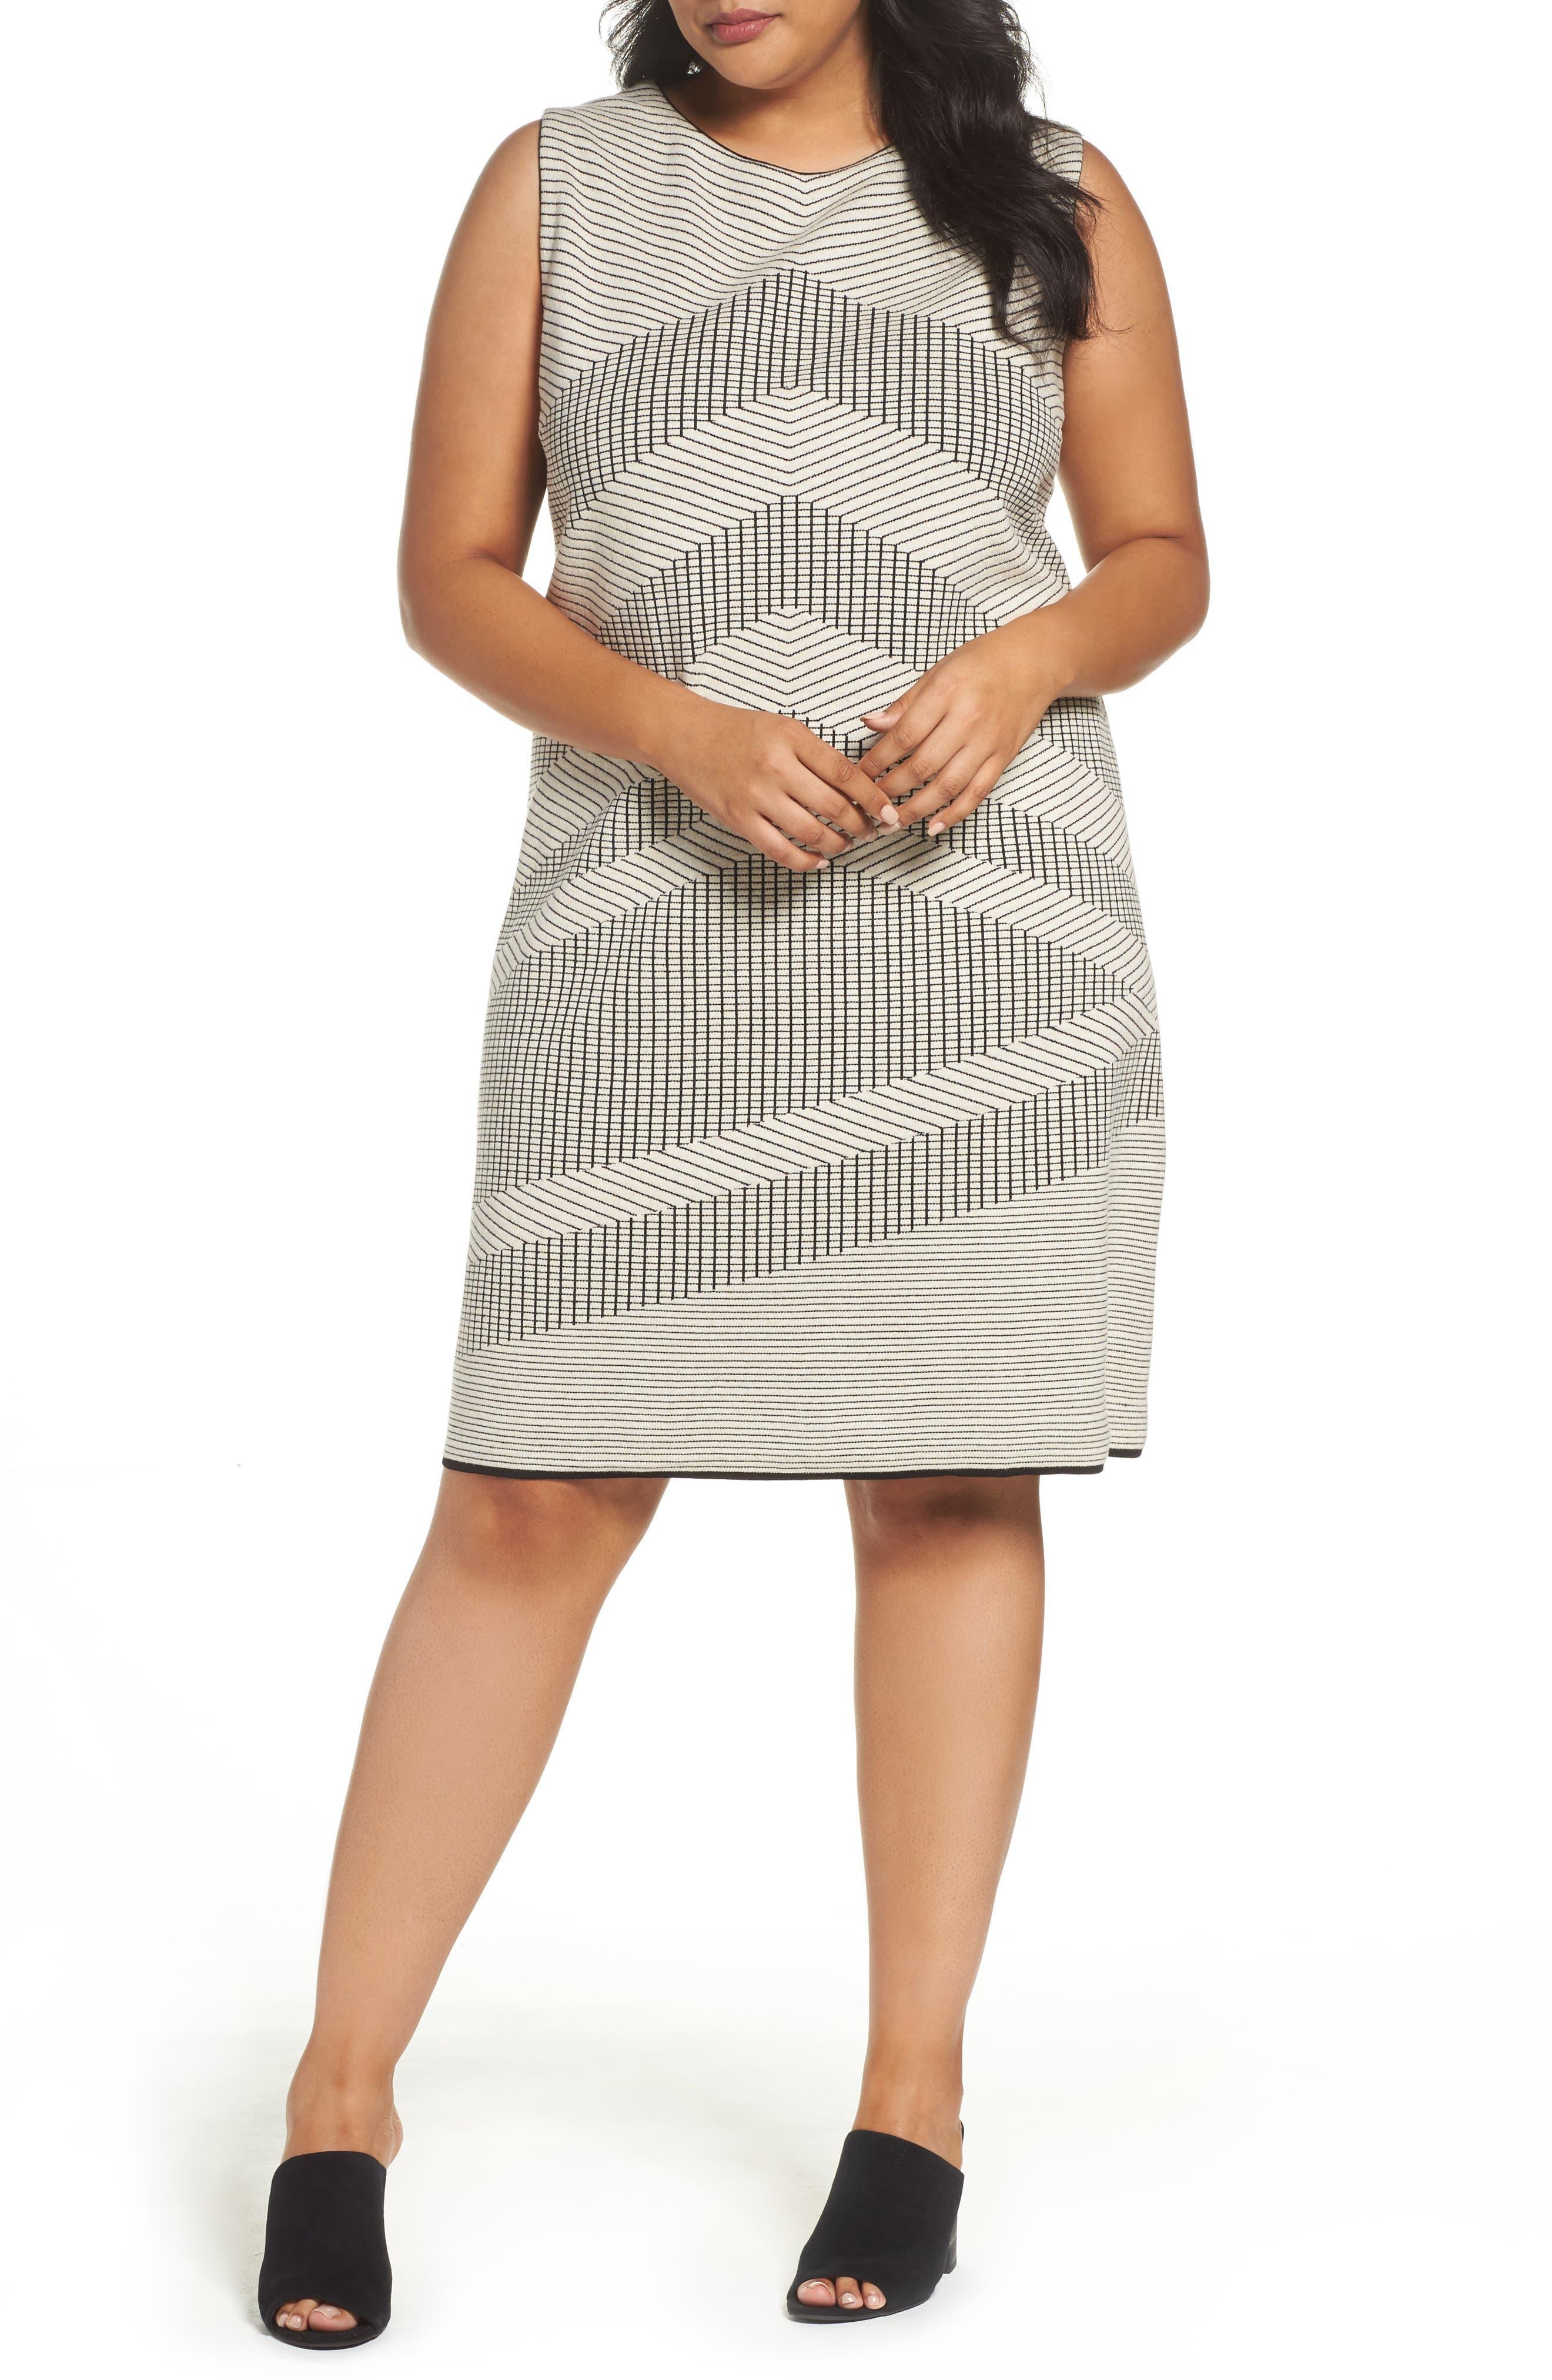 Mantra Chevron Stripe Knit Sheath Dress,                             Main thumbnail 1, color,                             Creme Brulee